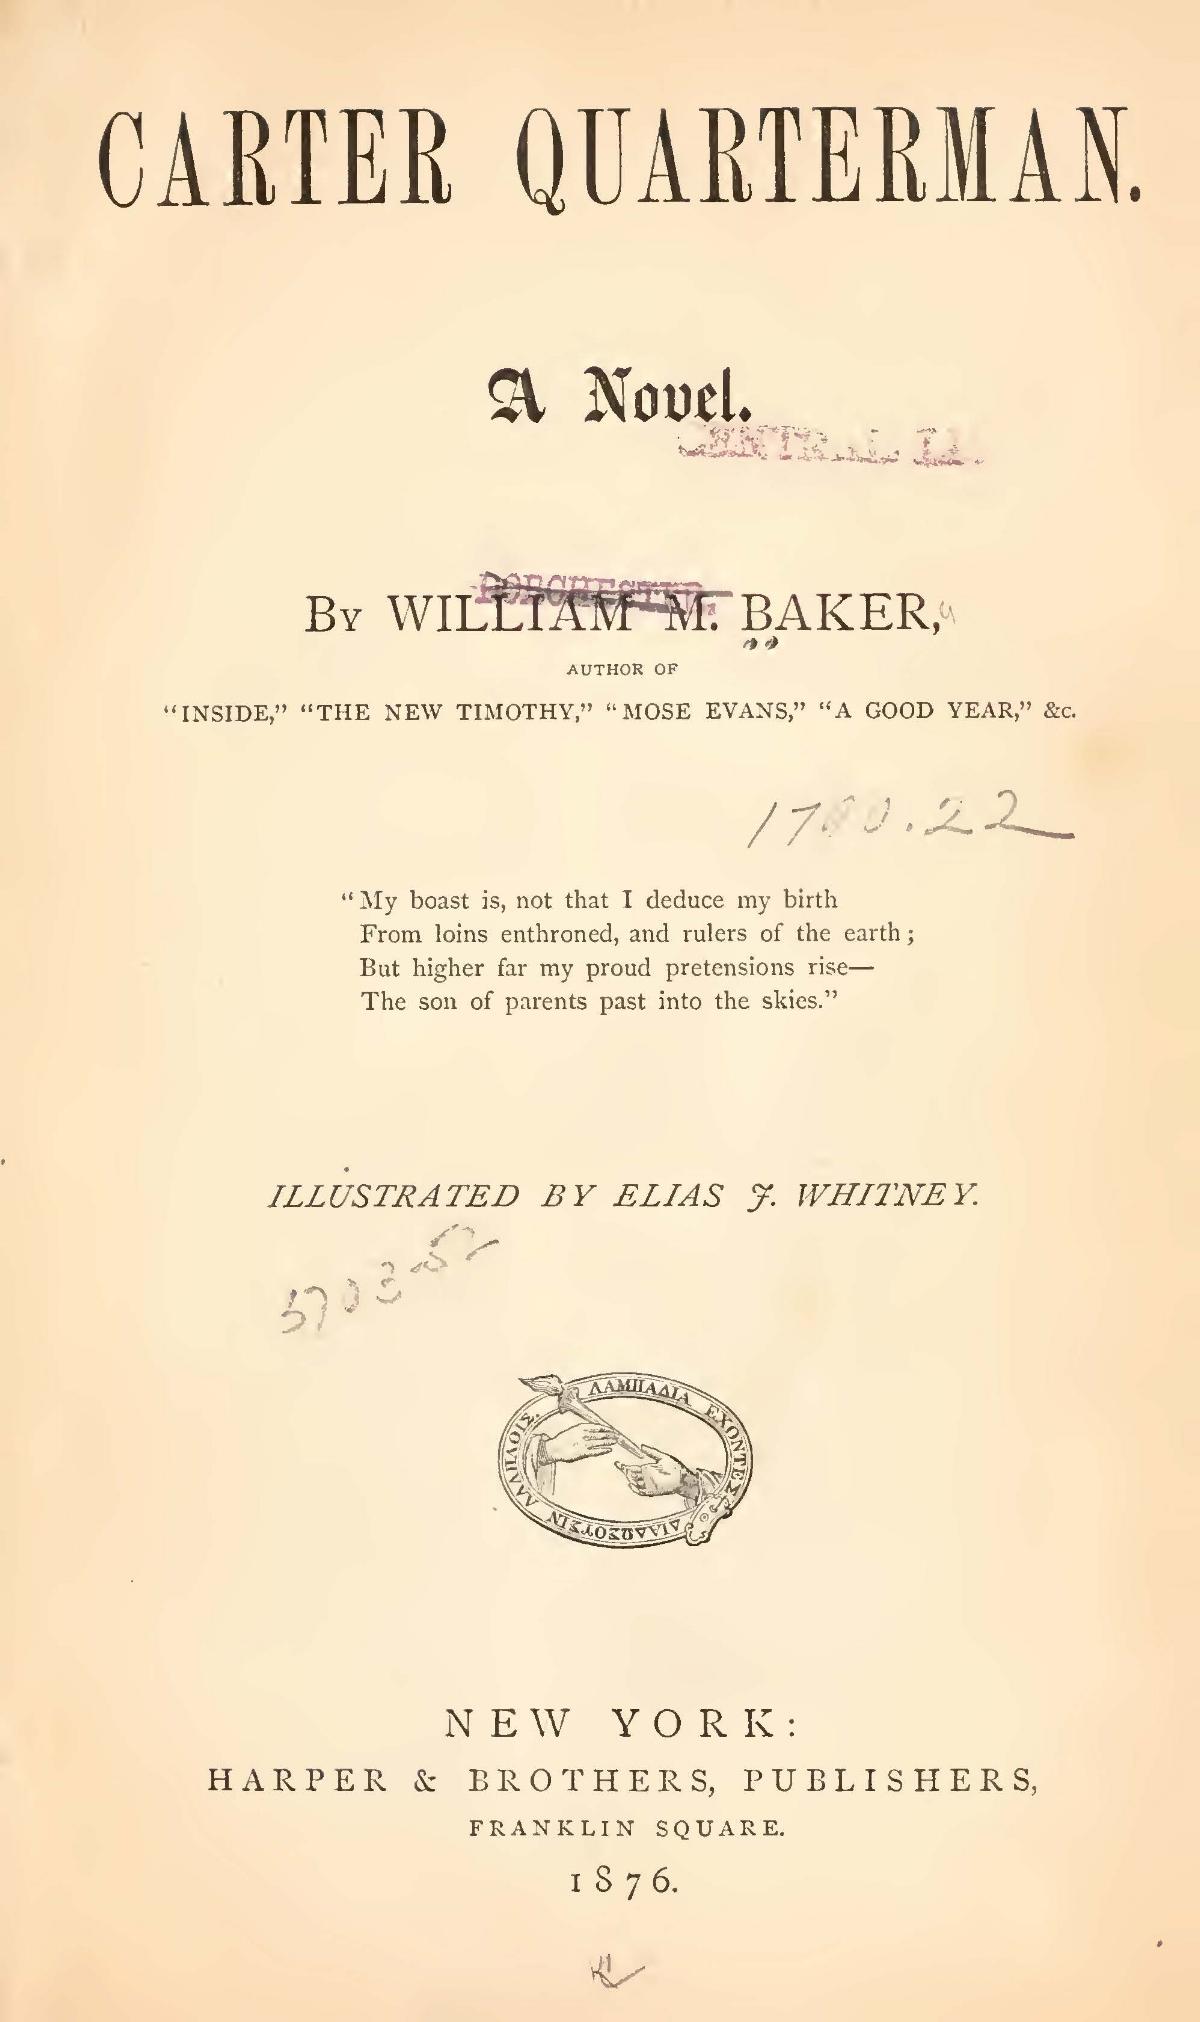 Baker, William Munford, Carter Quarterman Title Page.jpg